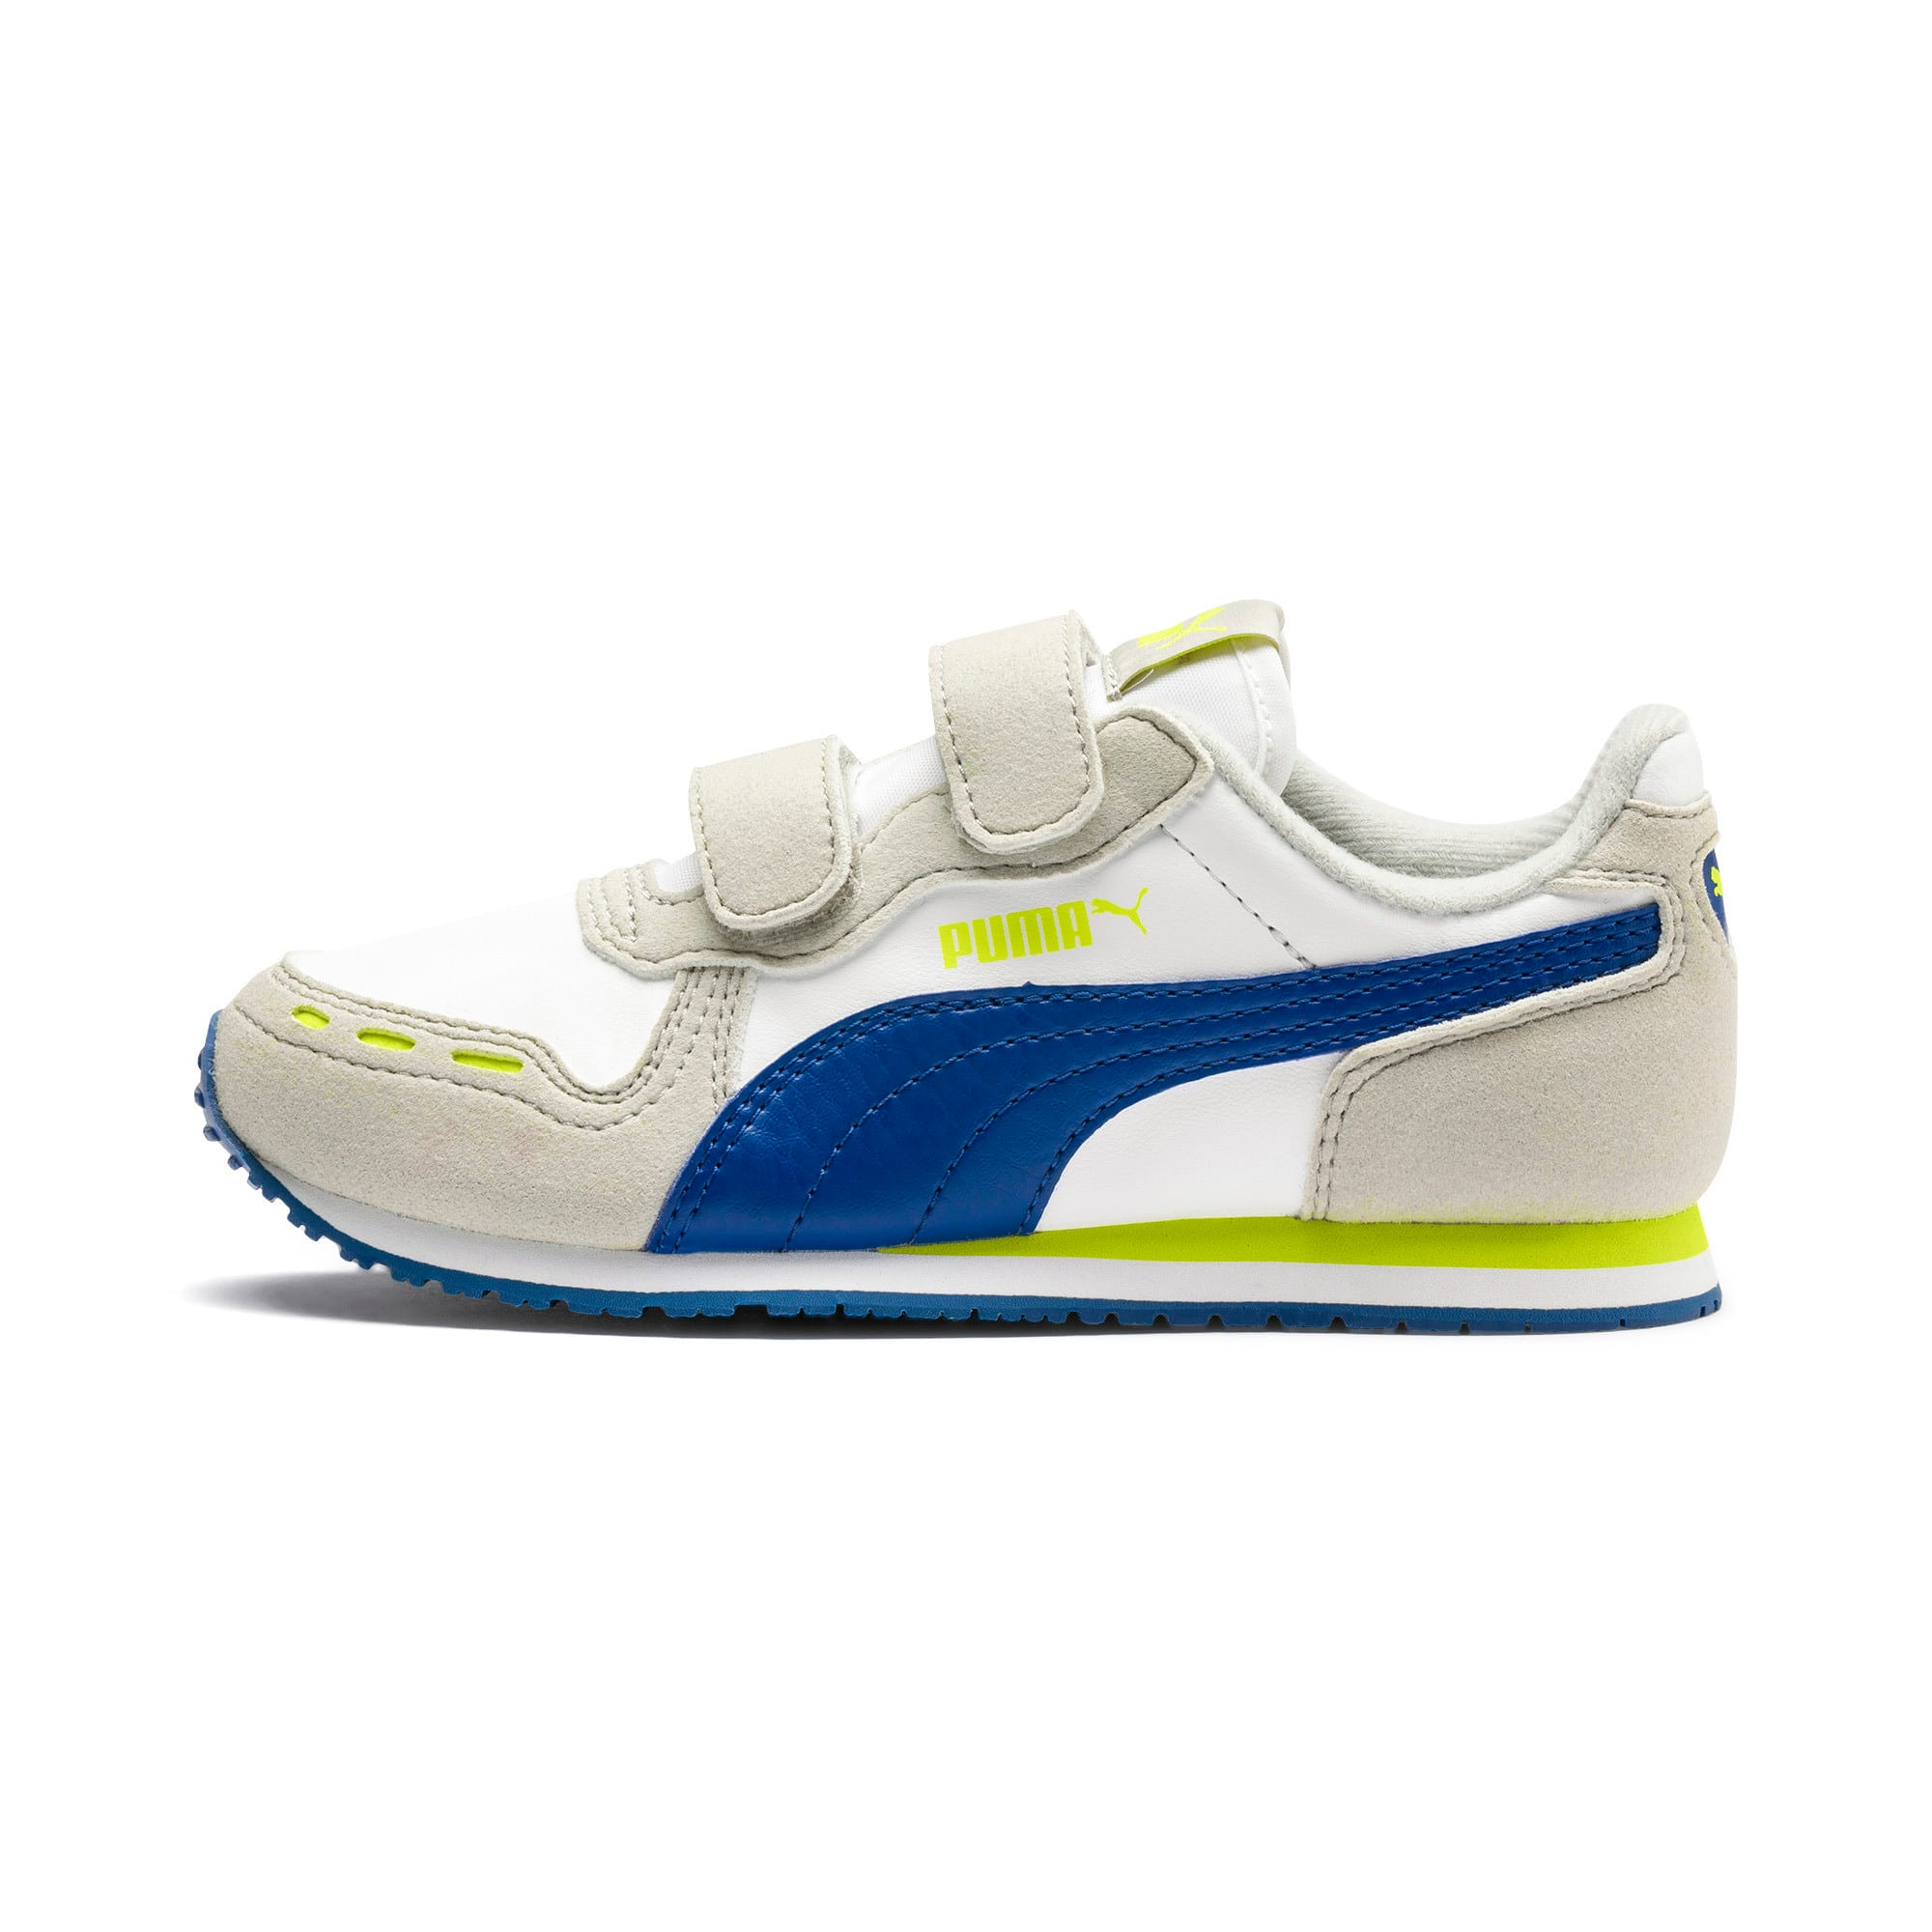 Thumbnail 1 of Cabana Racer SL V PS Baby Sneaker, Puma White-Galaxy Blue, medium